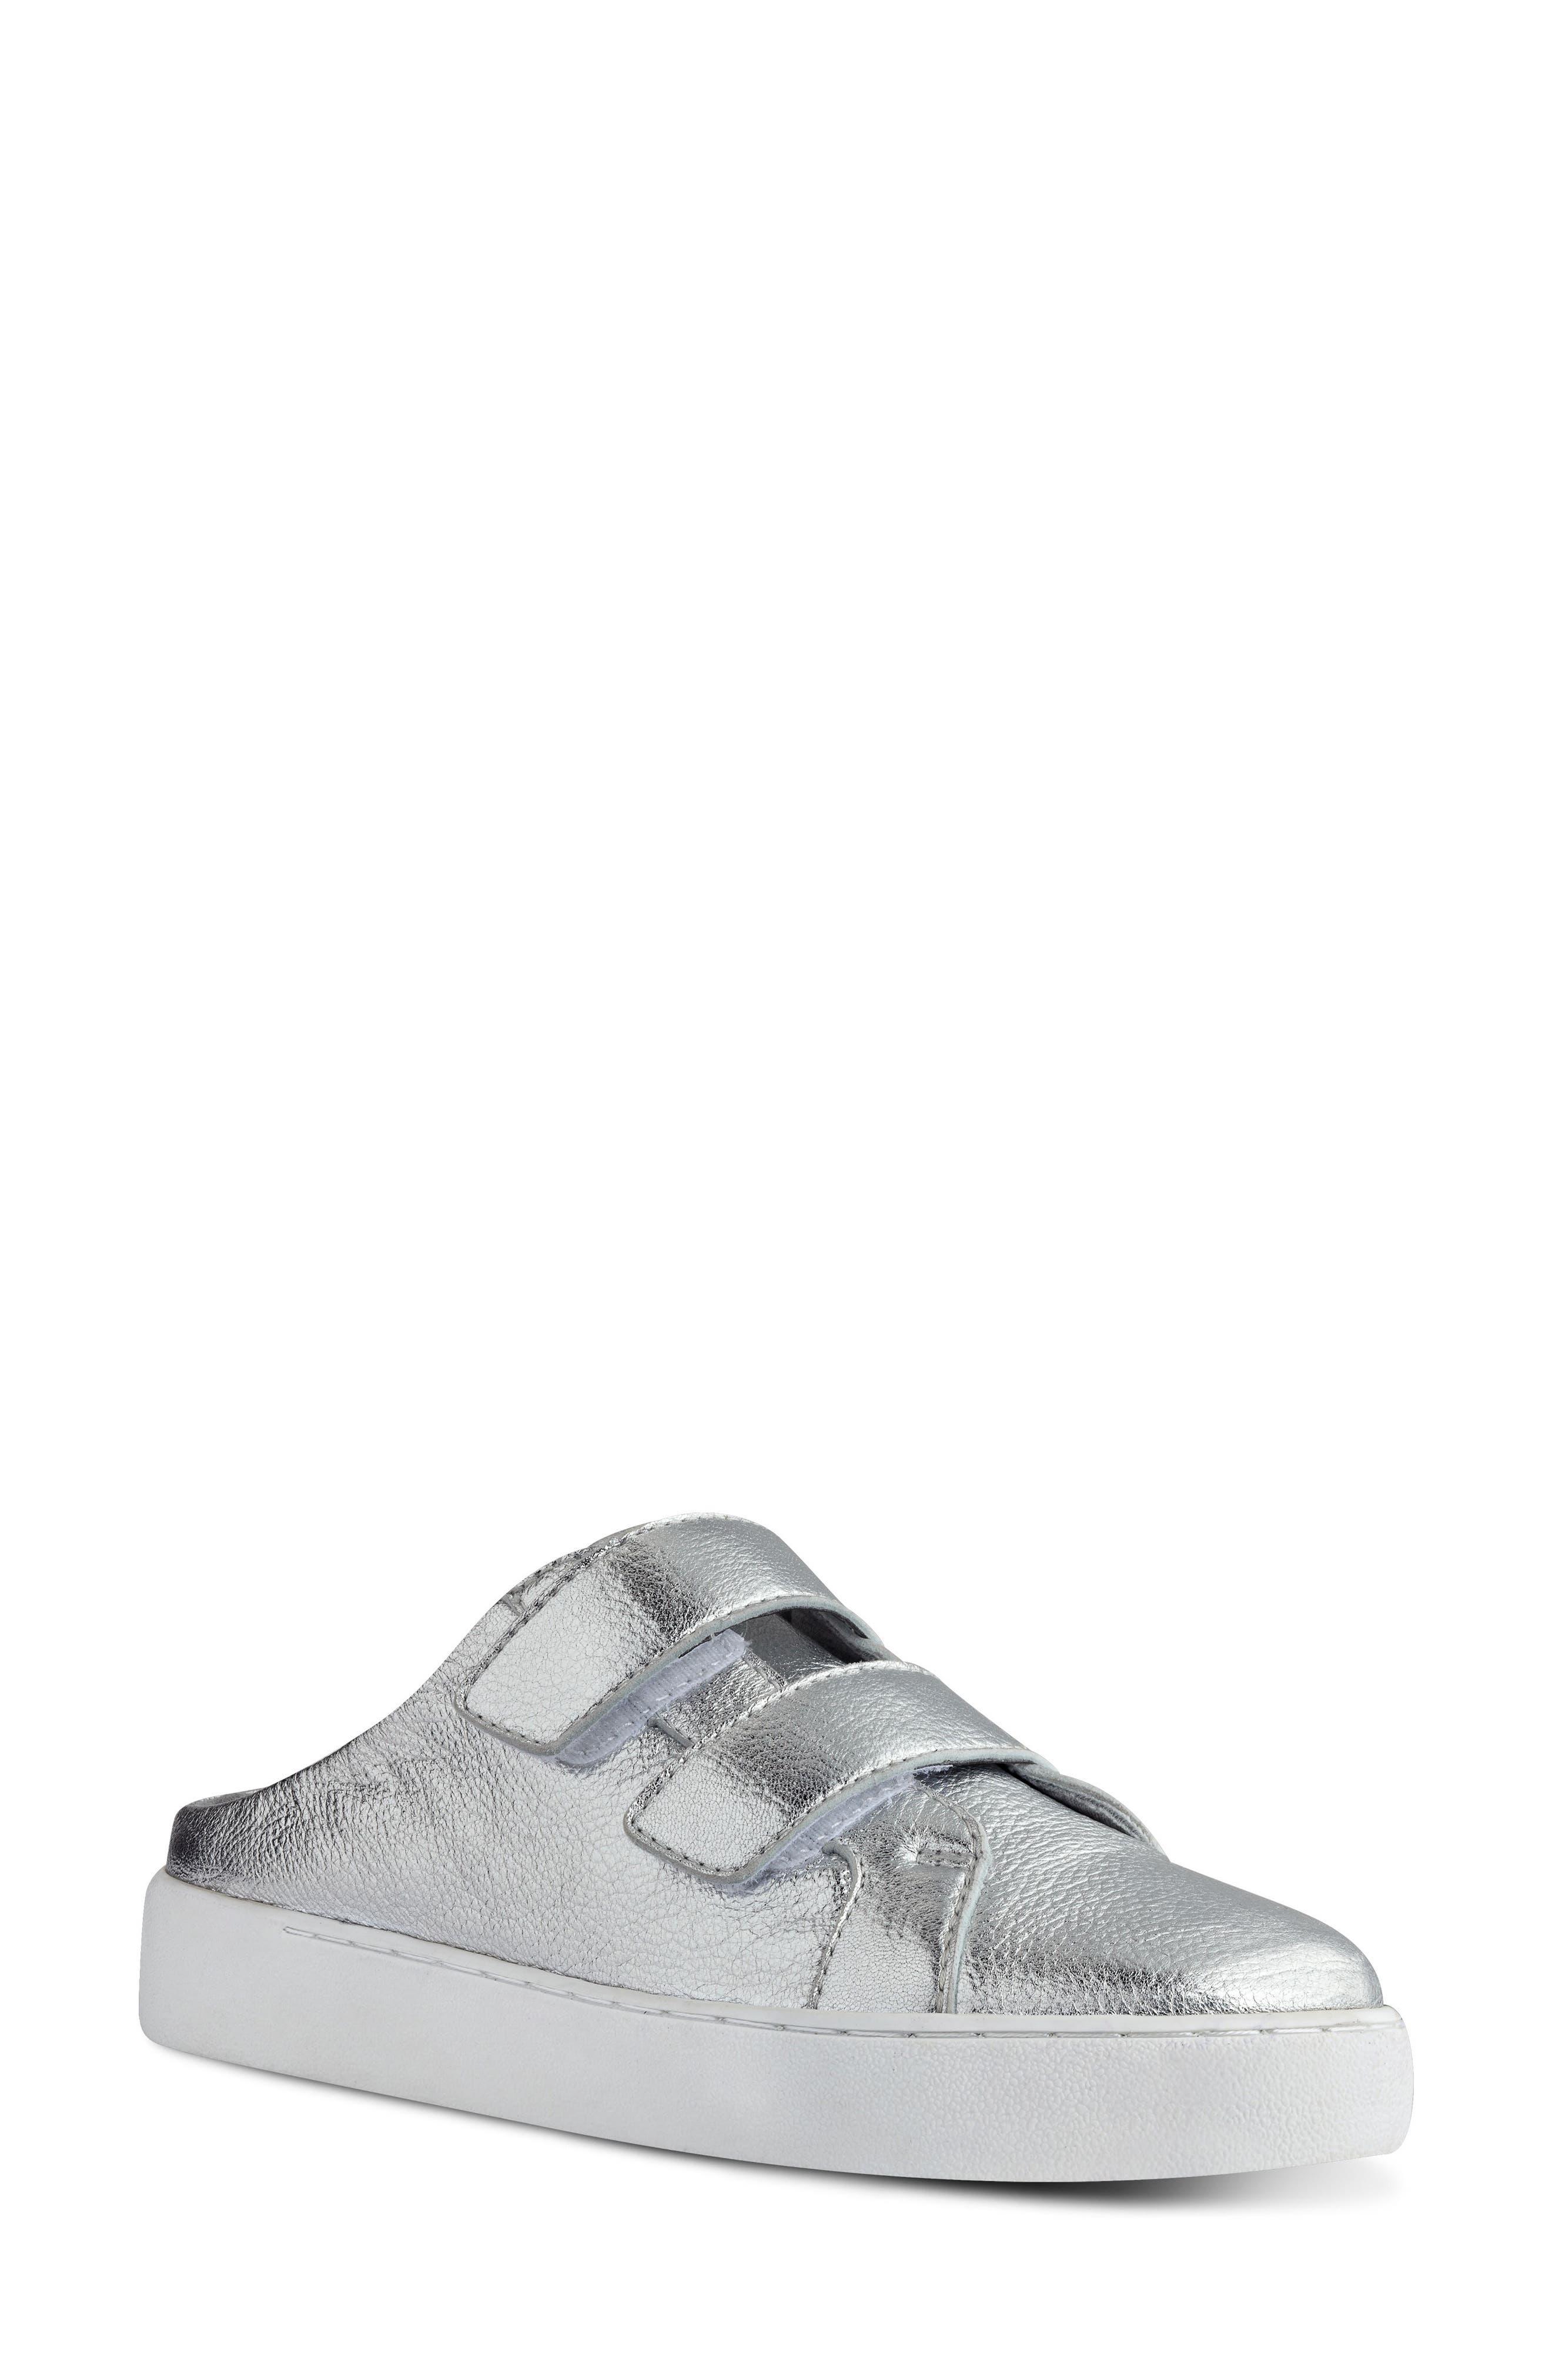 Poeton Sneaker Mule,                         Main,                         color,